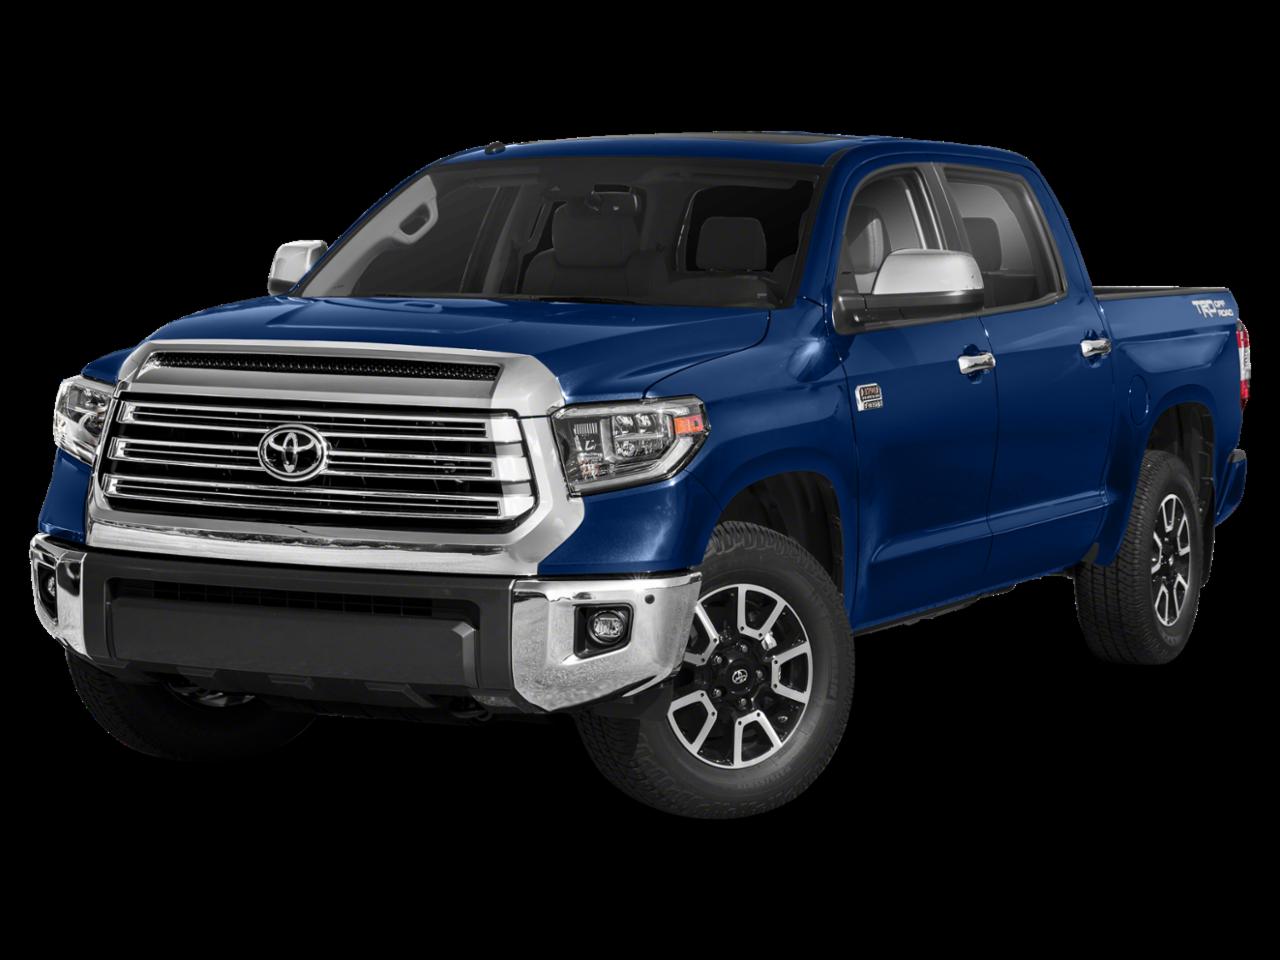 Toyota 2020 Tundra 4WD 1794 Edition